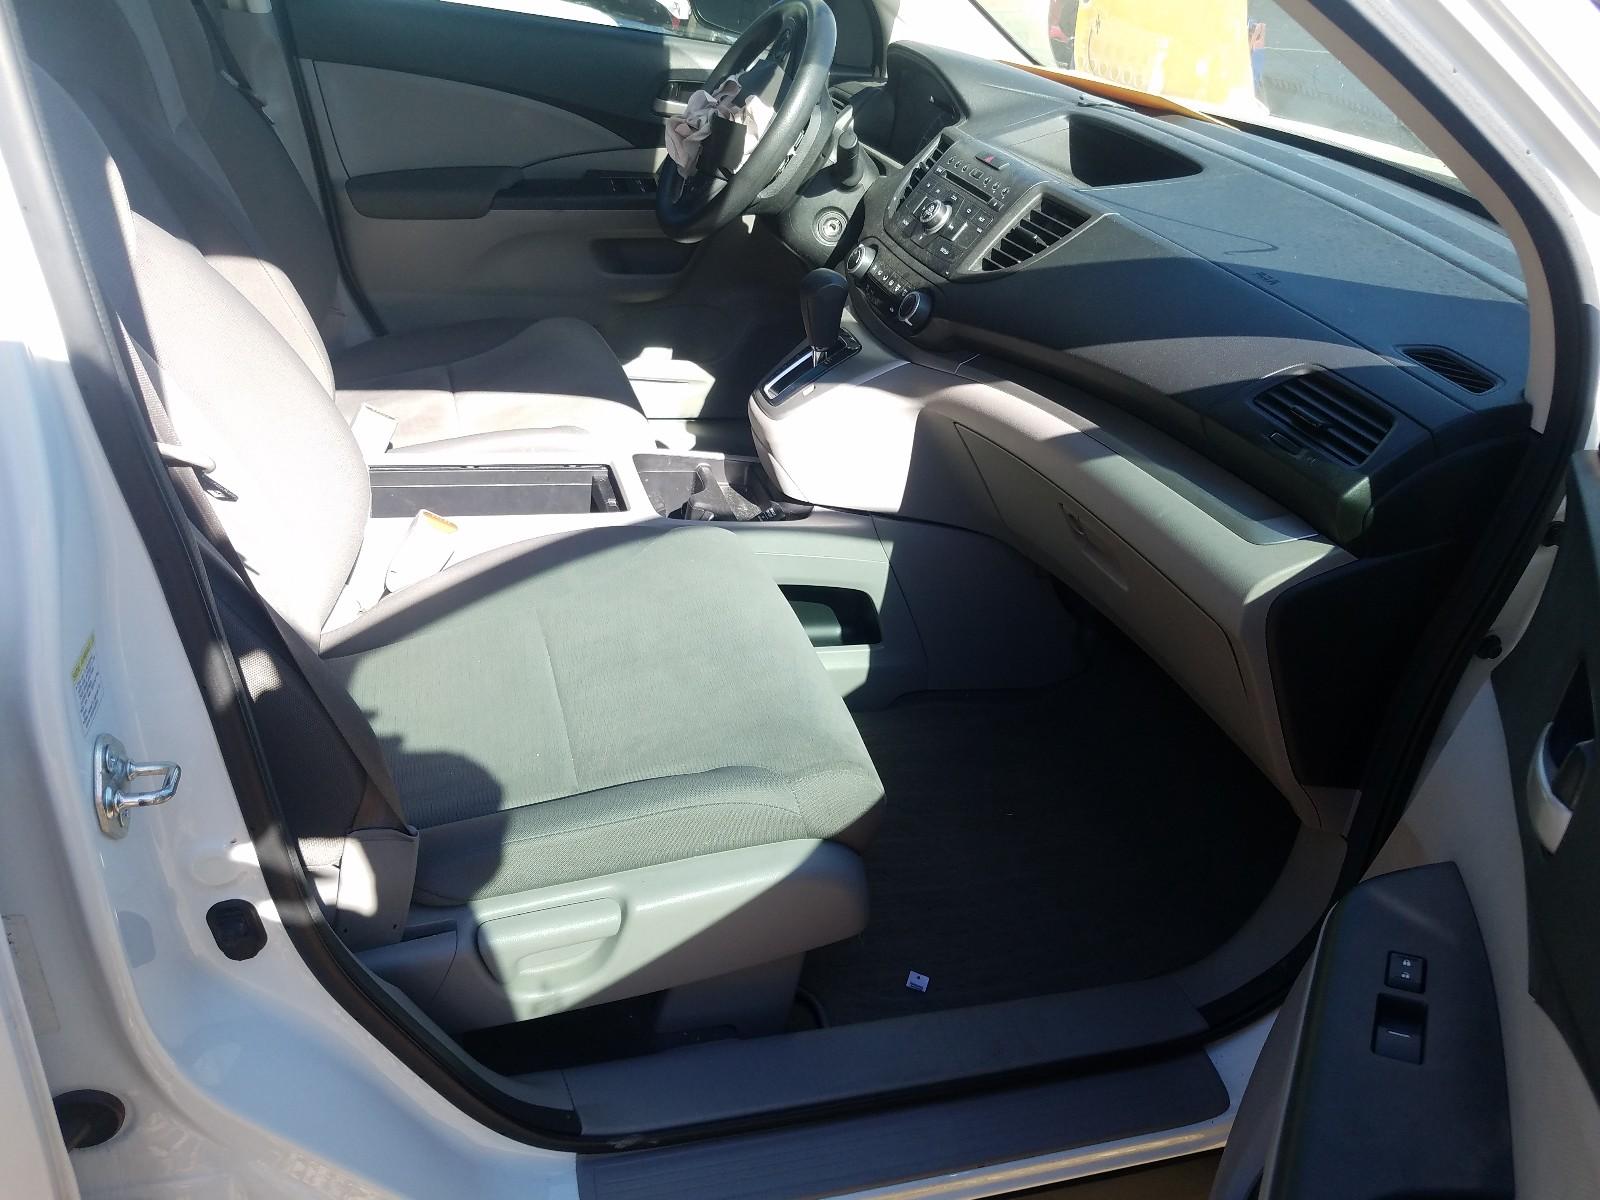 2013 Honda Cr-V Lx 2.4L close up View